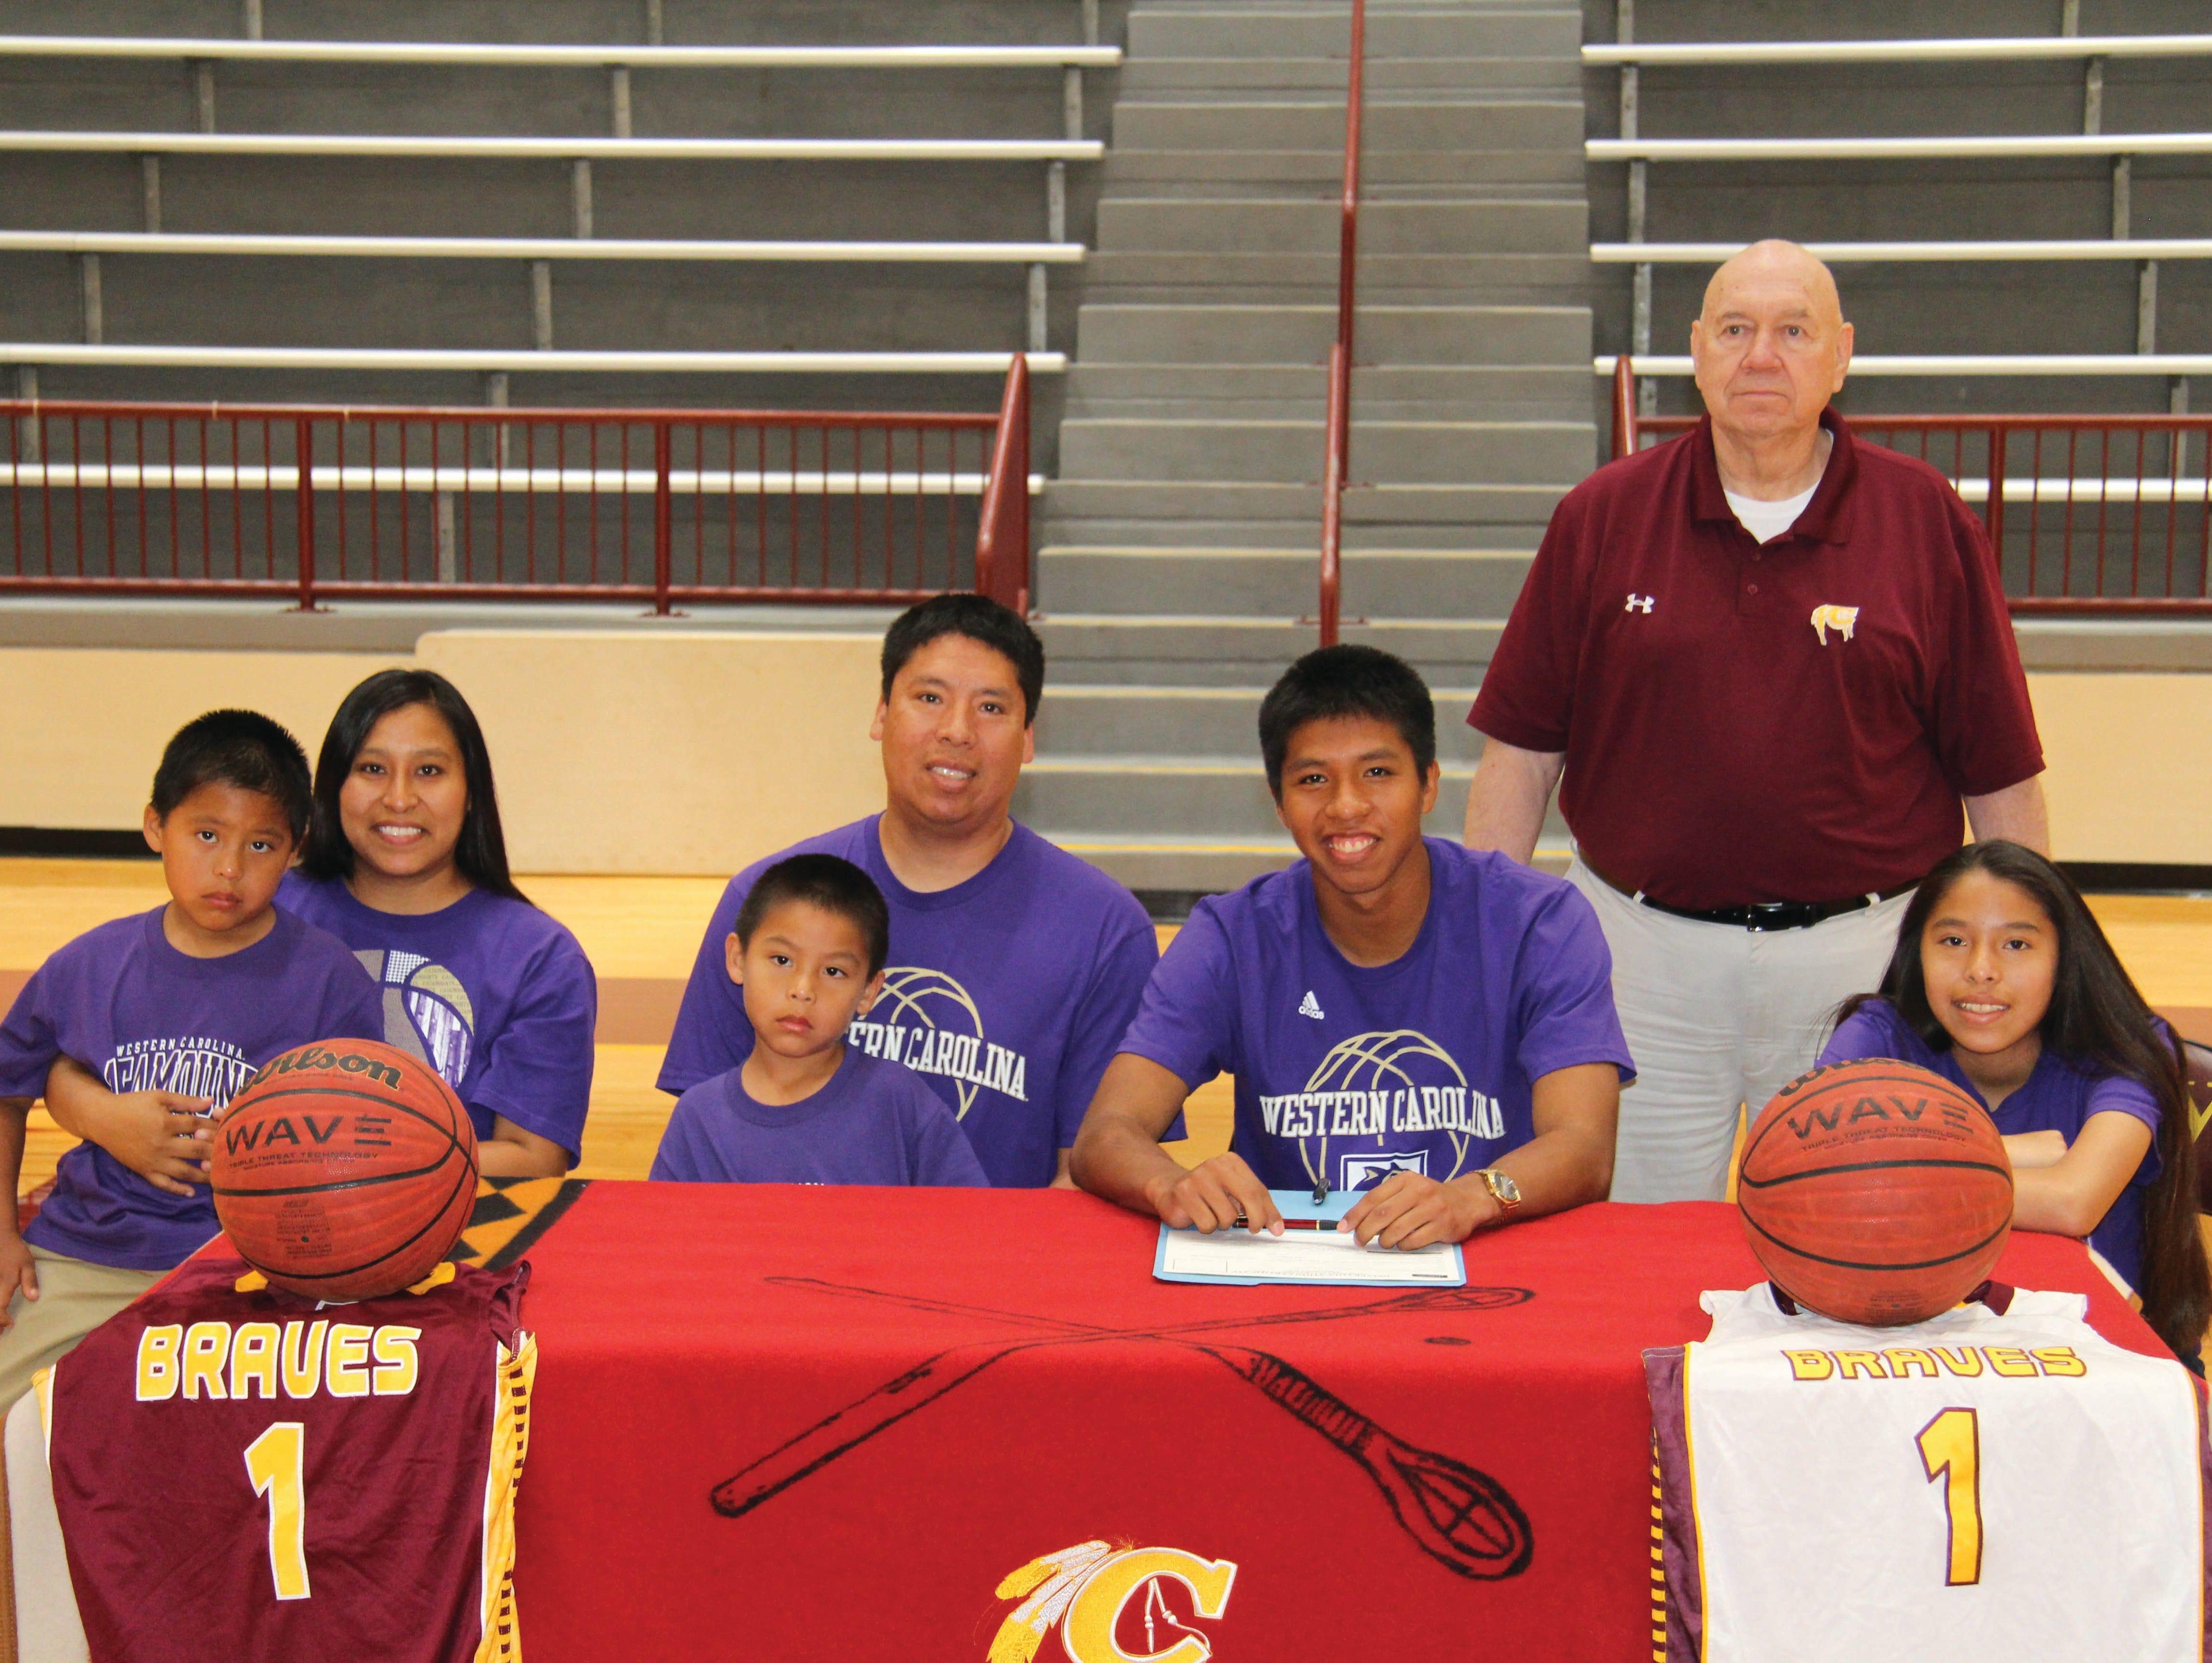 Cherokee senior Jason McMillan has signed to play college basketball for Western Carolina University.